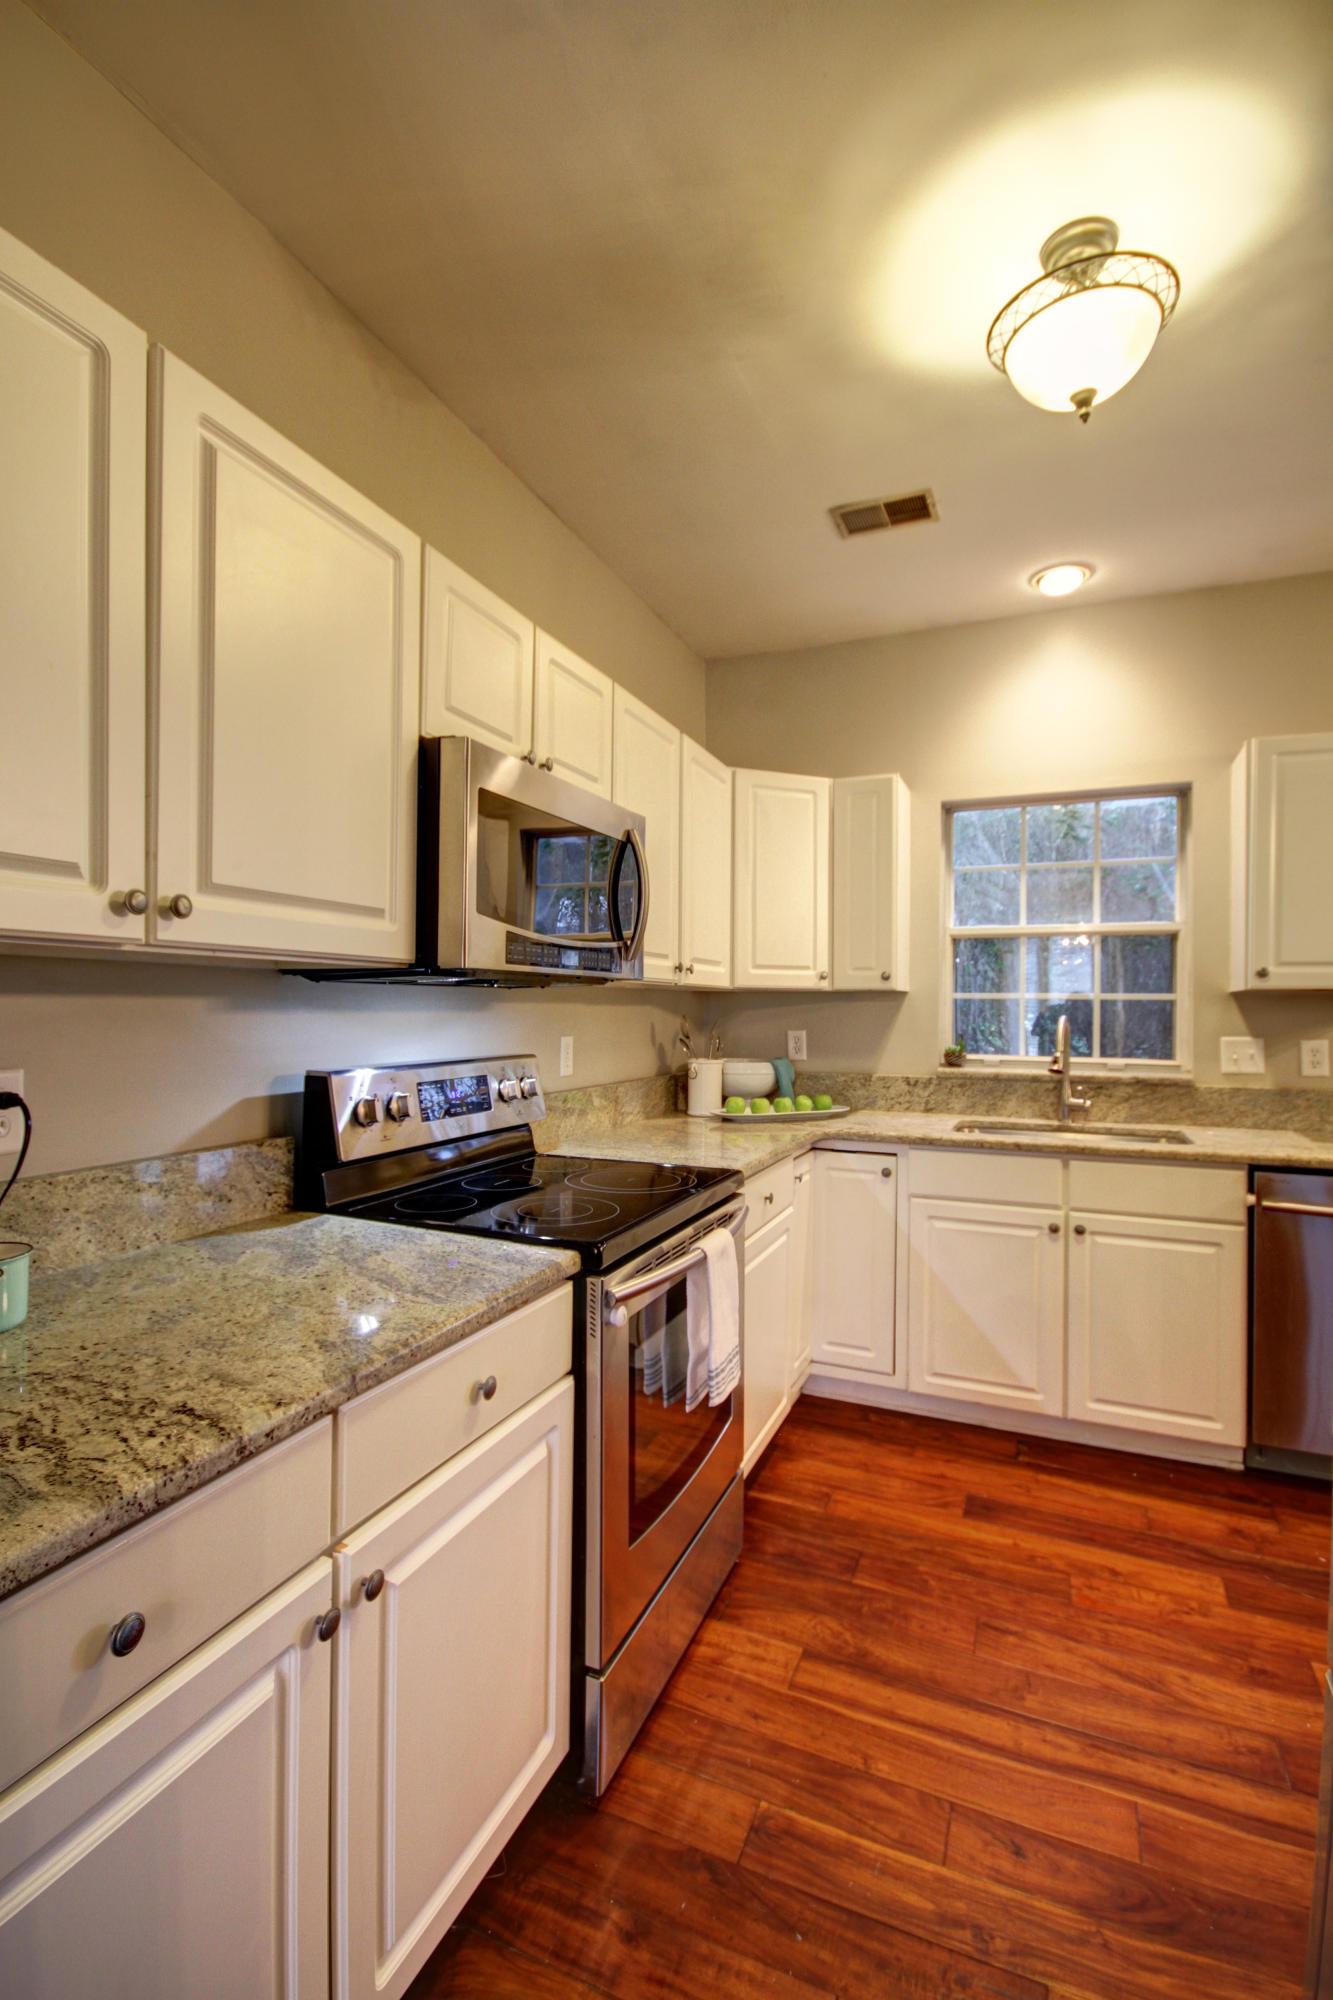 Belle Hall Homes For Sale - 373 Jardinere, Mount Pleasant, SC - 16